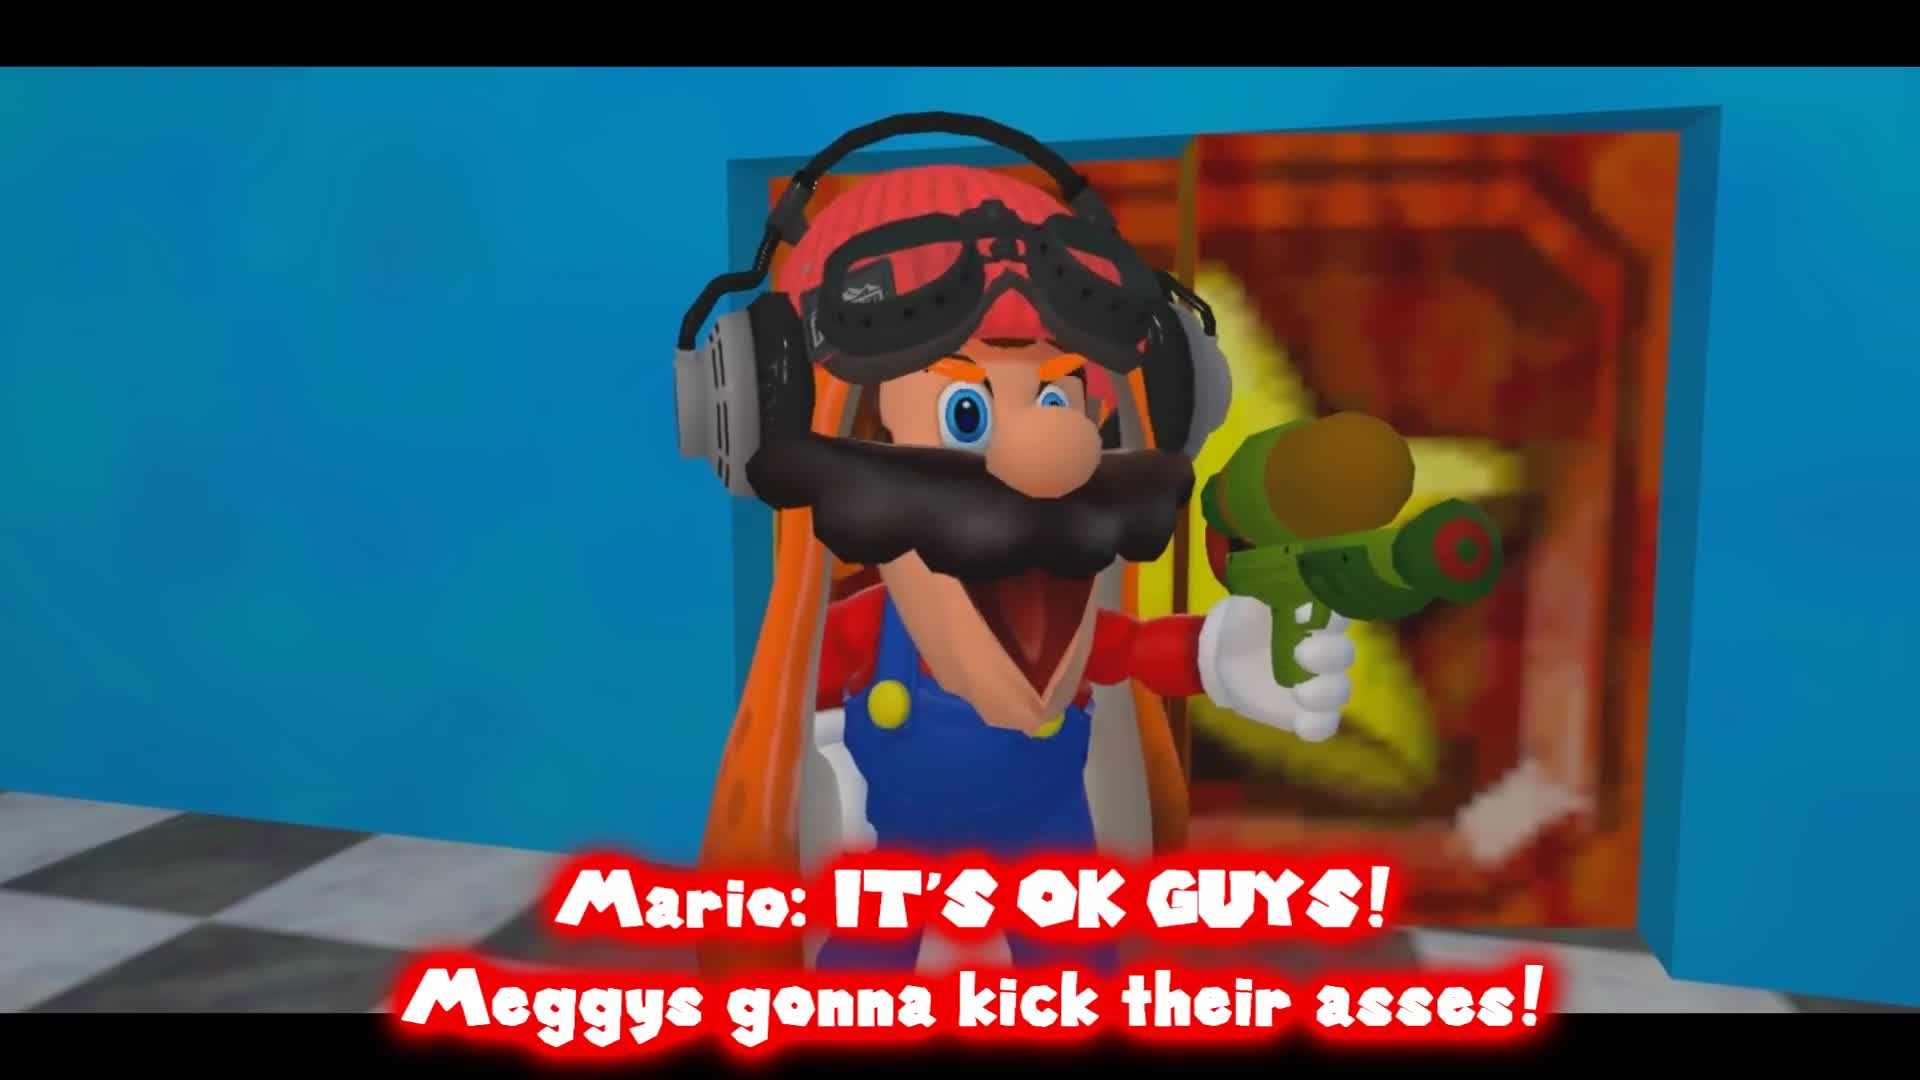 Bros, Hobo, Mario, Nintendo, SM64, SMG4, Super, Super Mario, Super Mario 64, Supermarioglitchy4, did GIFs